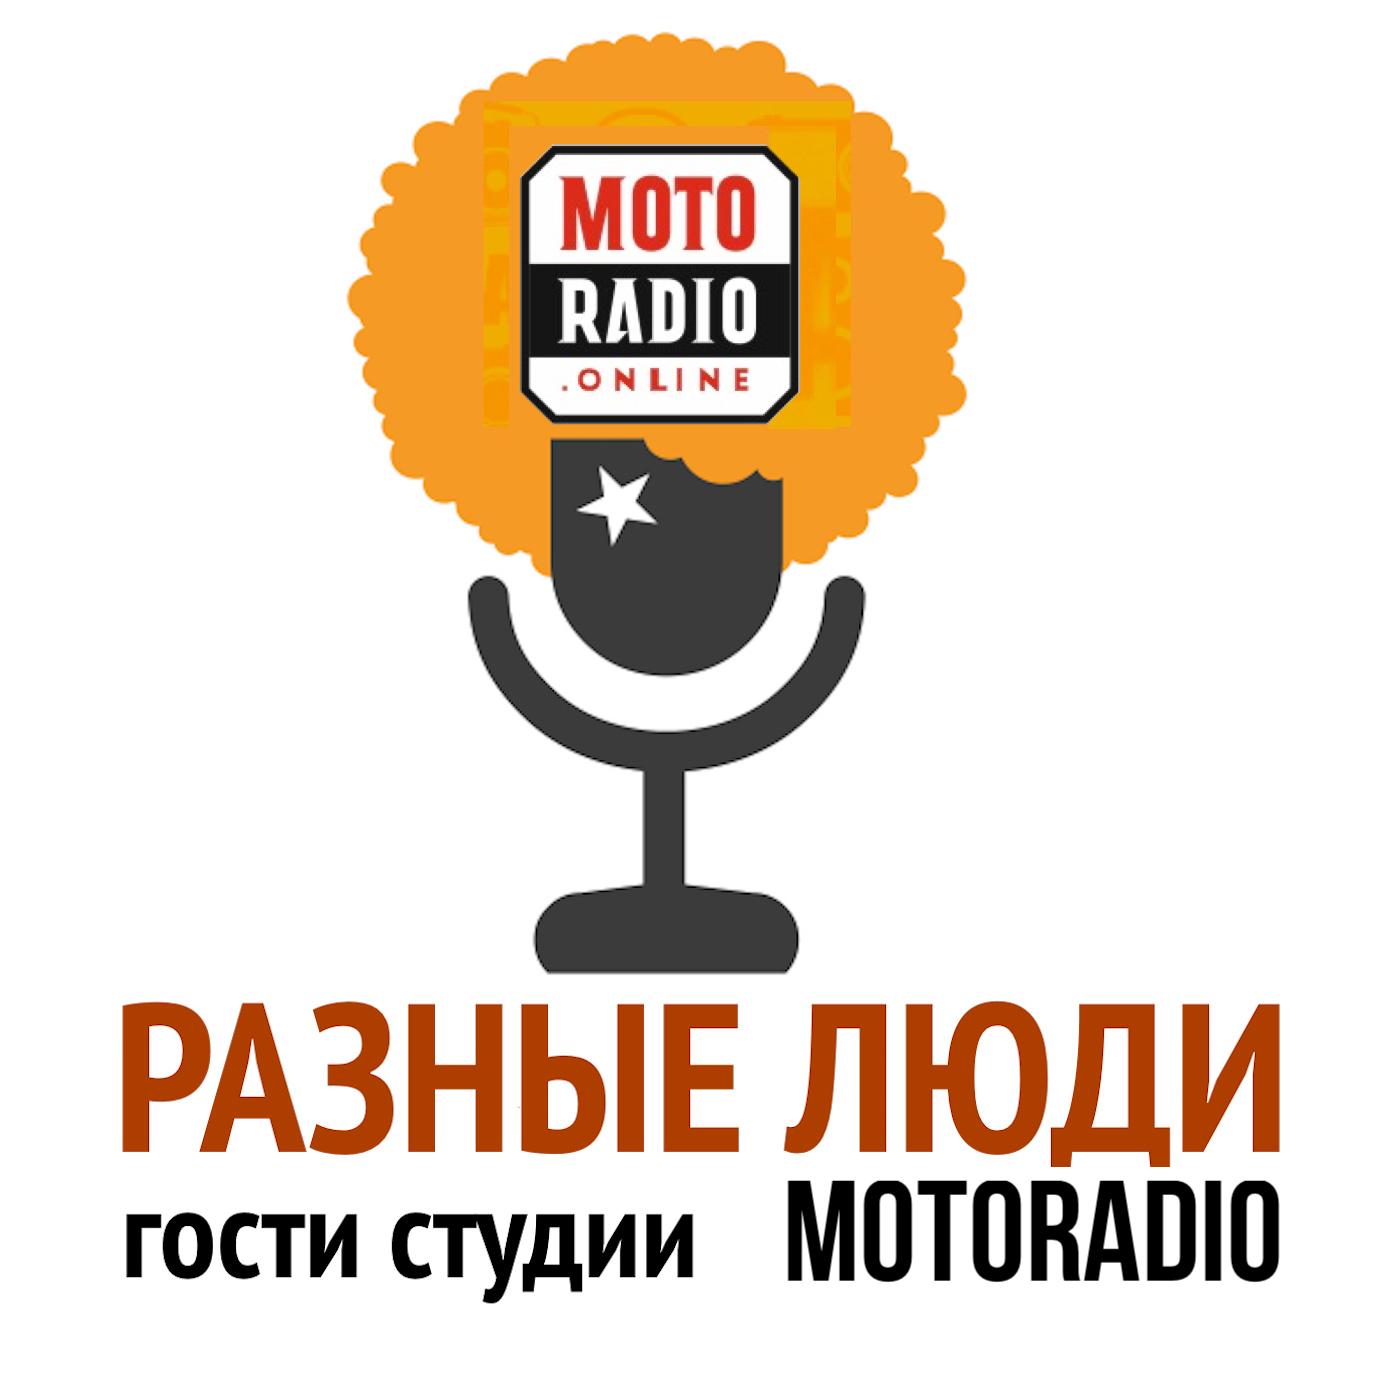 цены Моторадио Главный редактор журнала